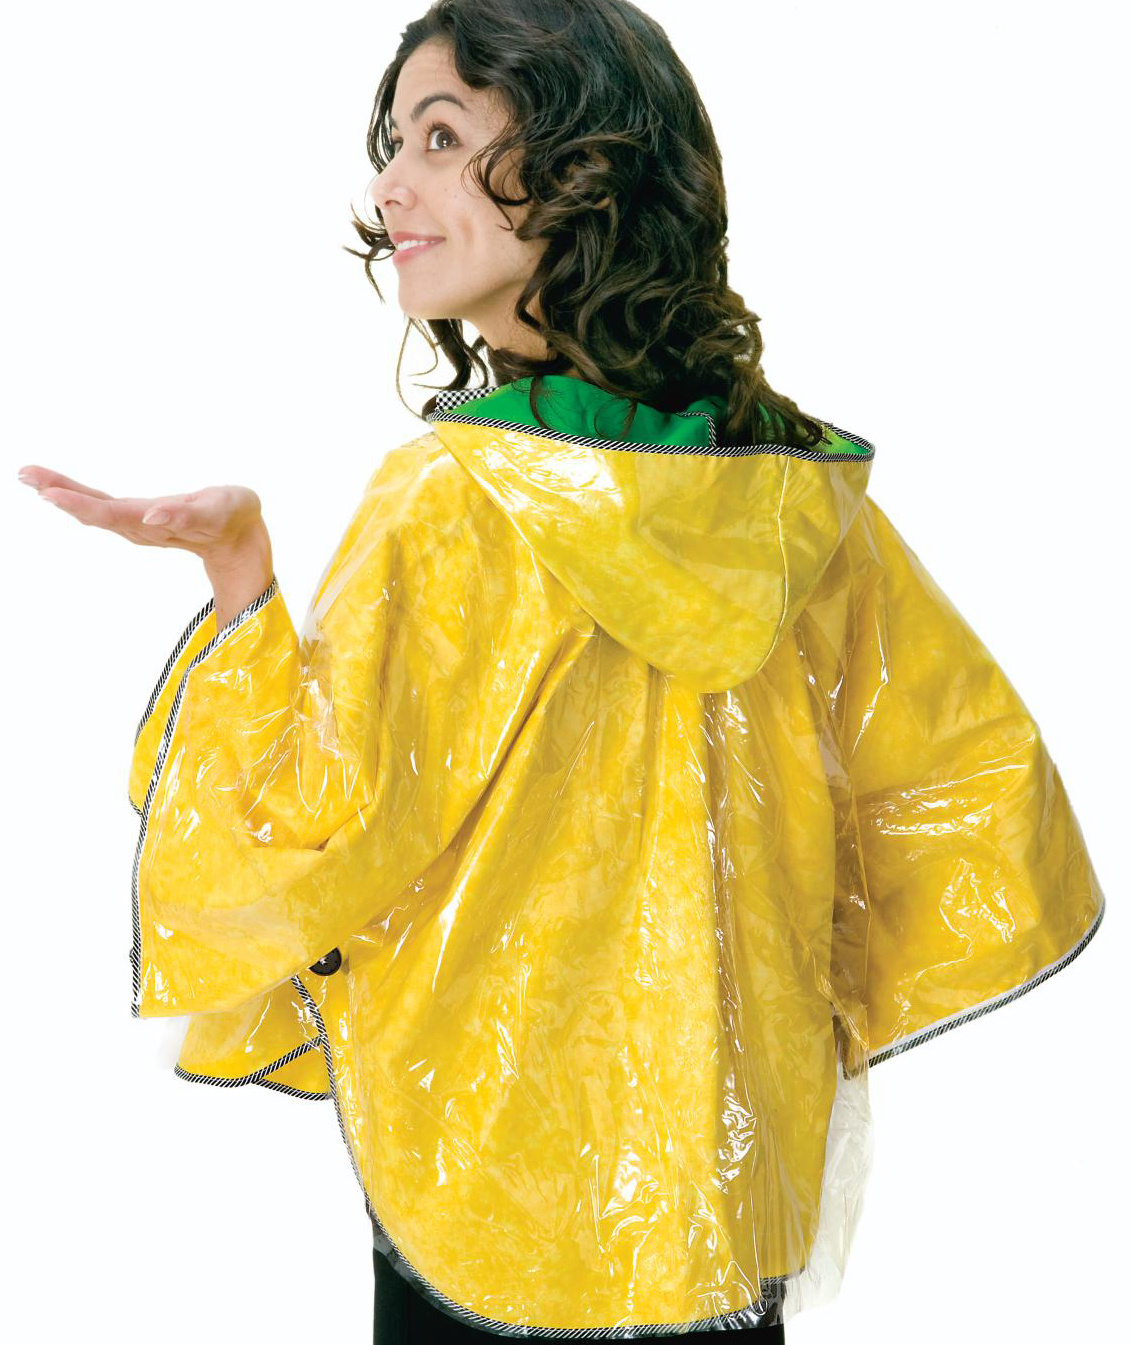 Yellow Rain Jacket Clip Art Let it rain yellow slicker